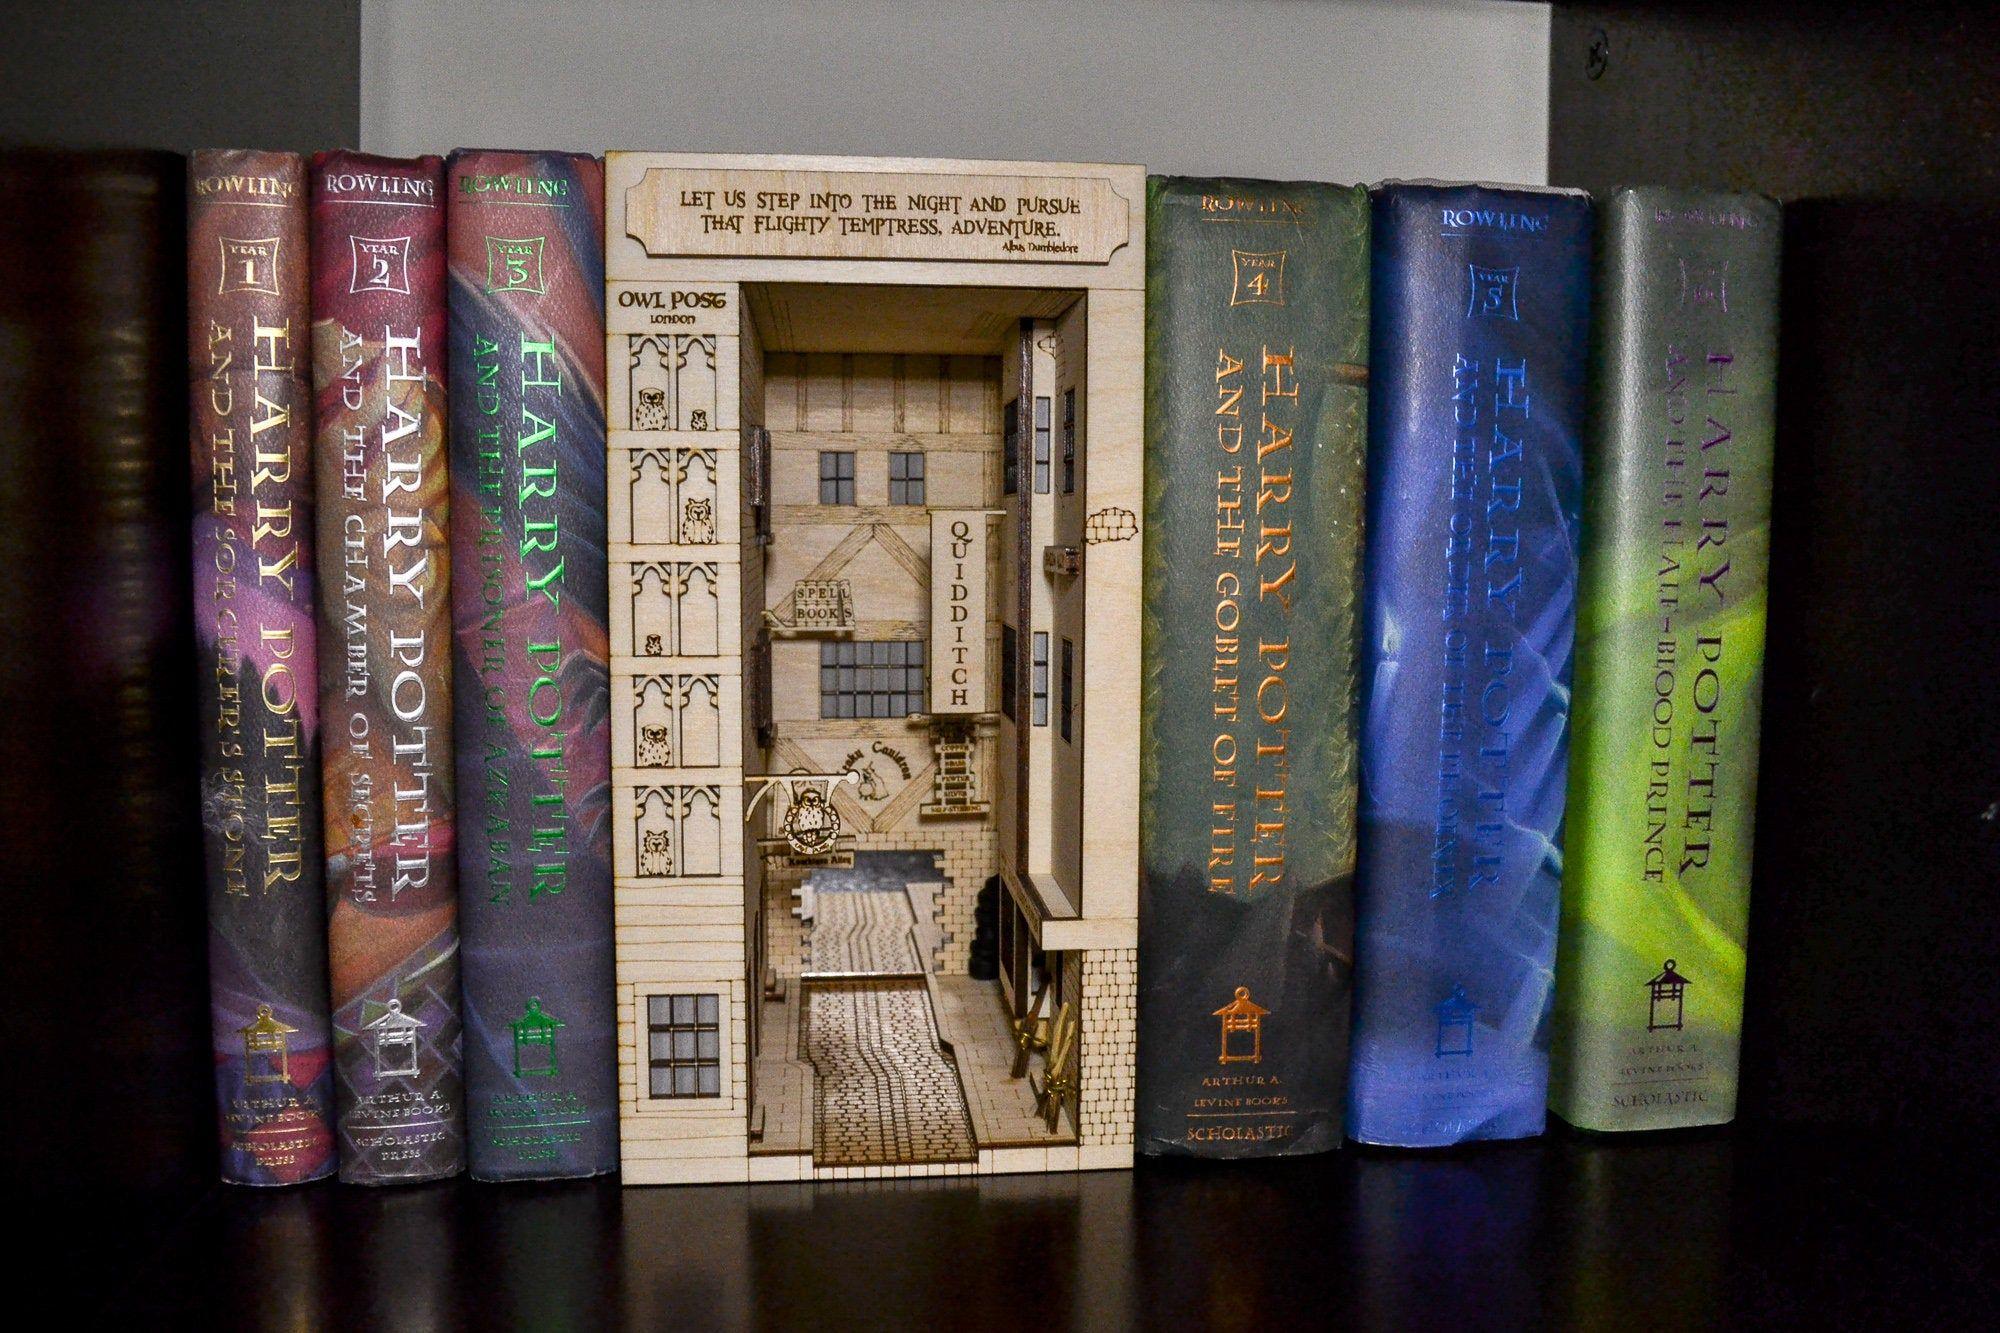 Harry Potter Diagon Alley Inspired Bookshelf Art Diy Kit Etsy Bookshelf Art Book Nooks Harry Potter Diagon Alley